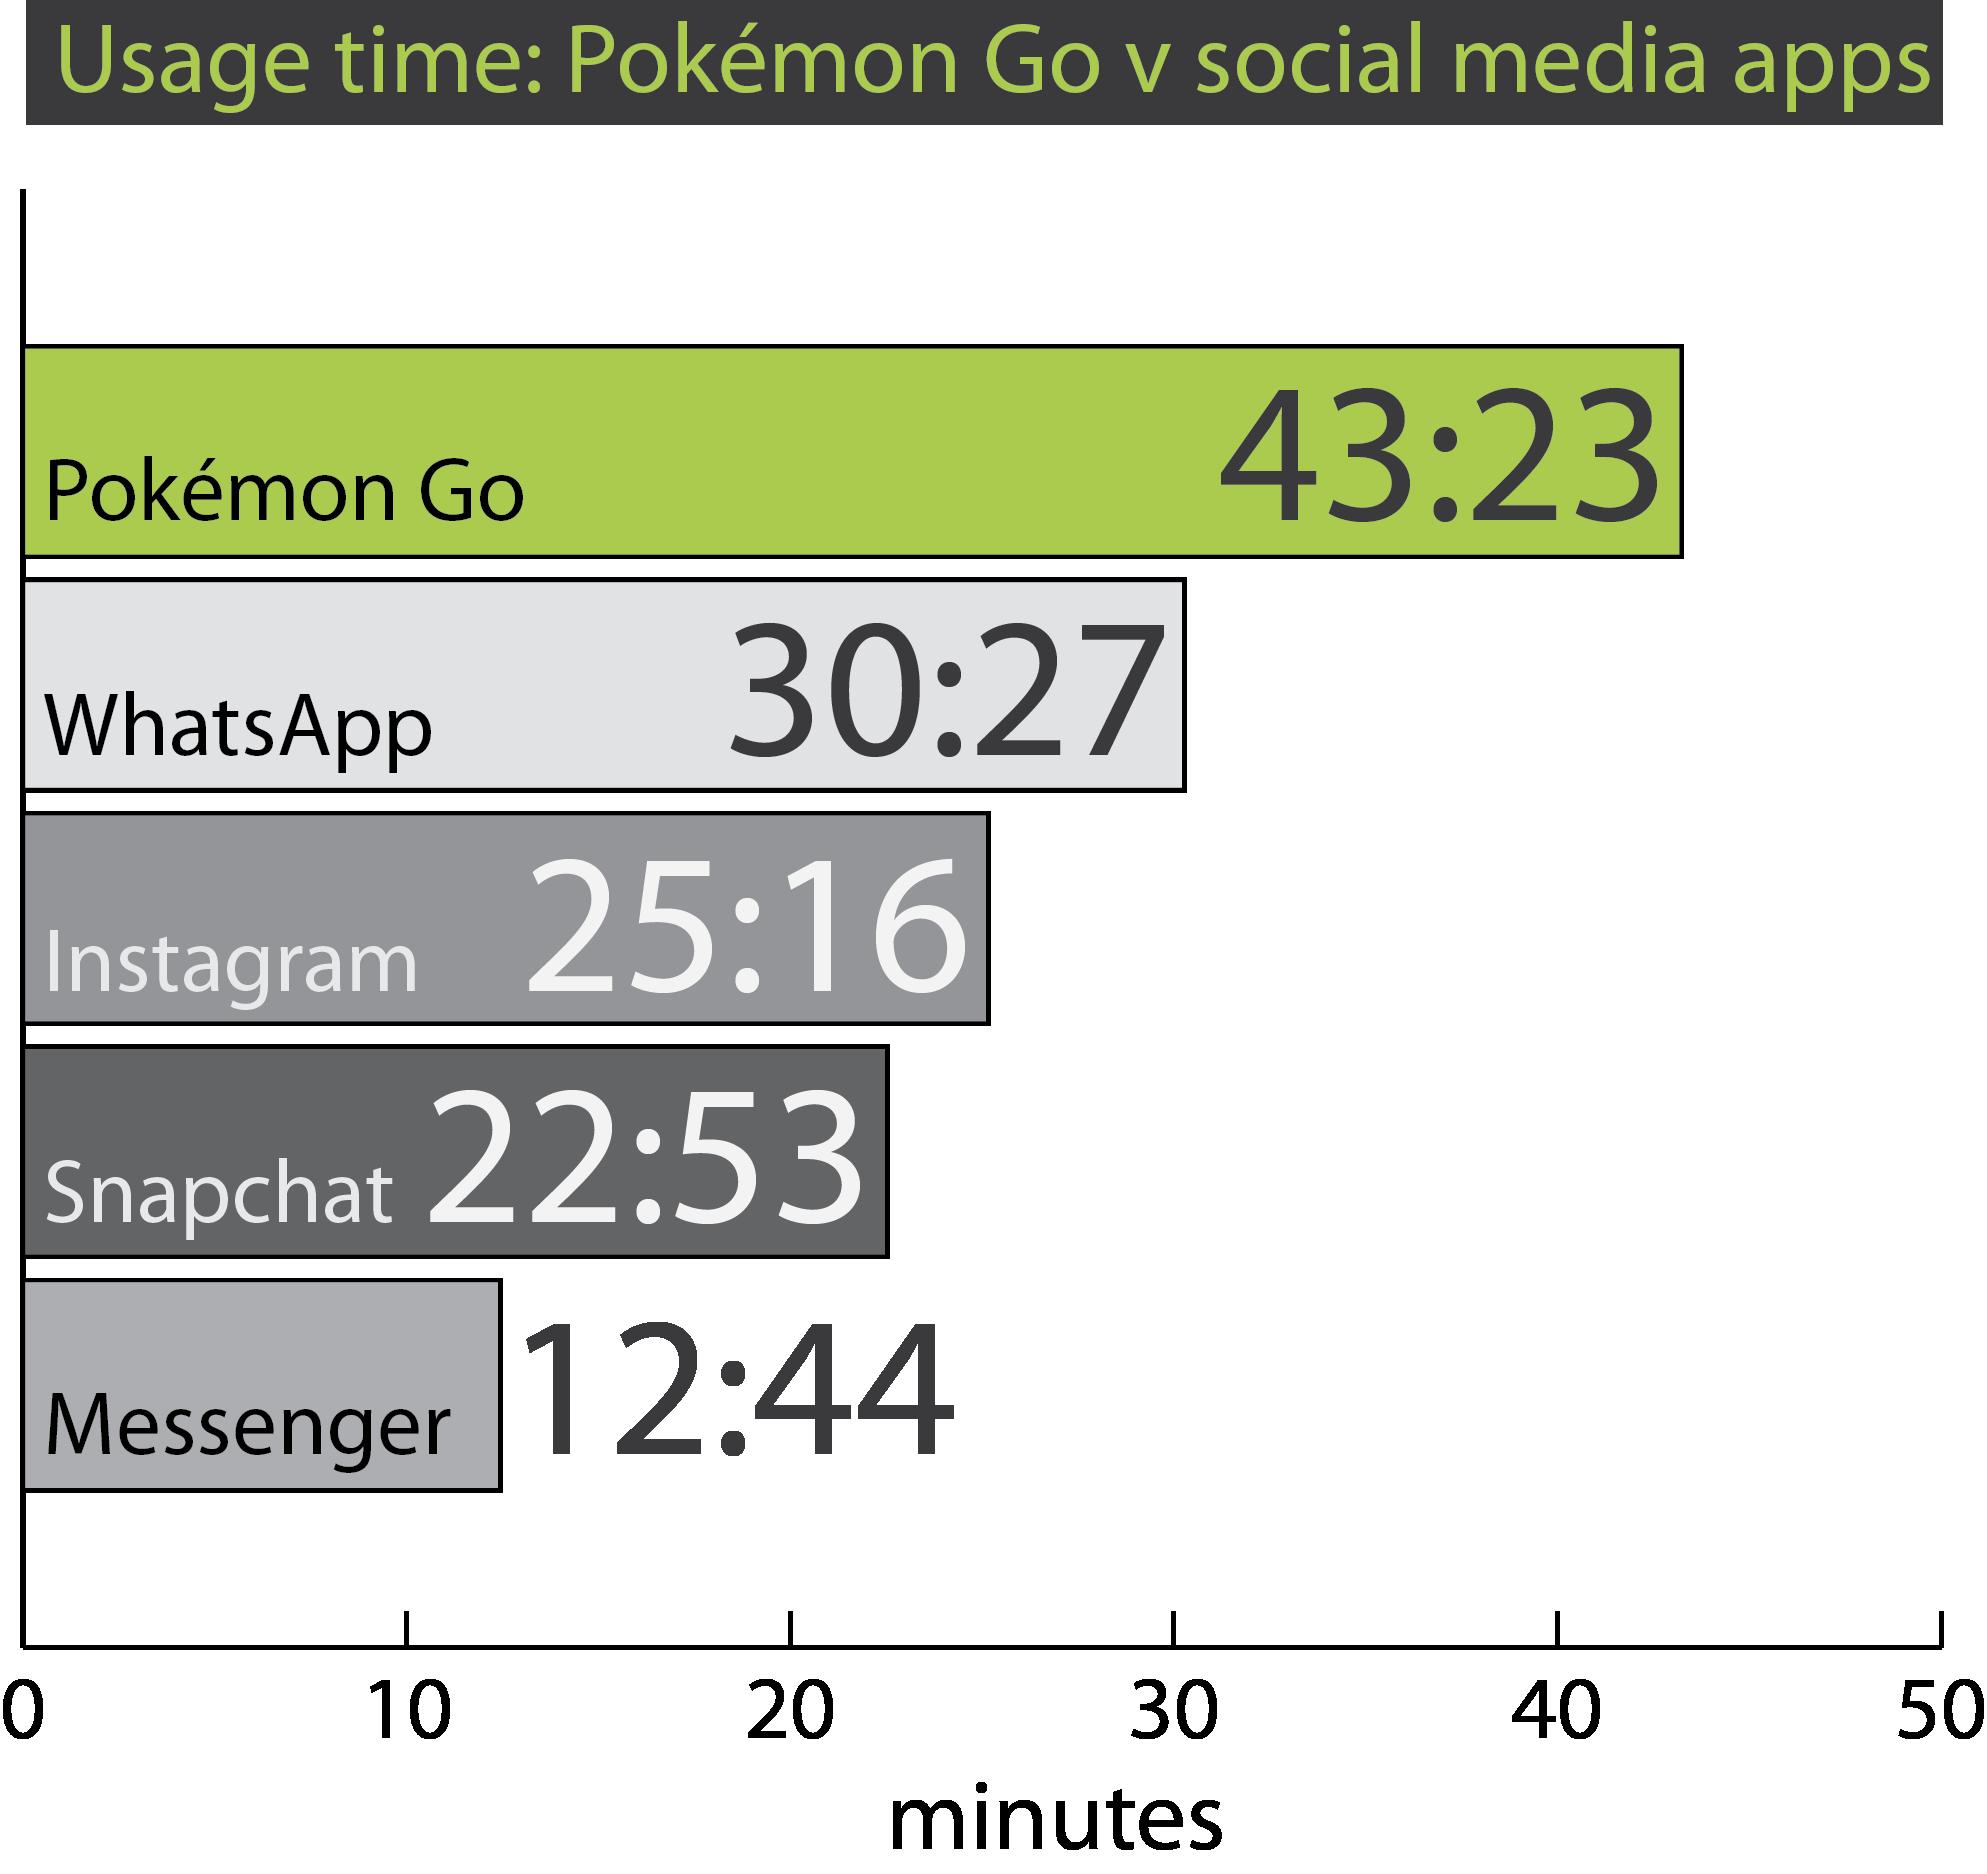 Pokémon Go versus social media